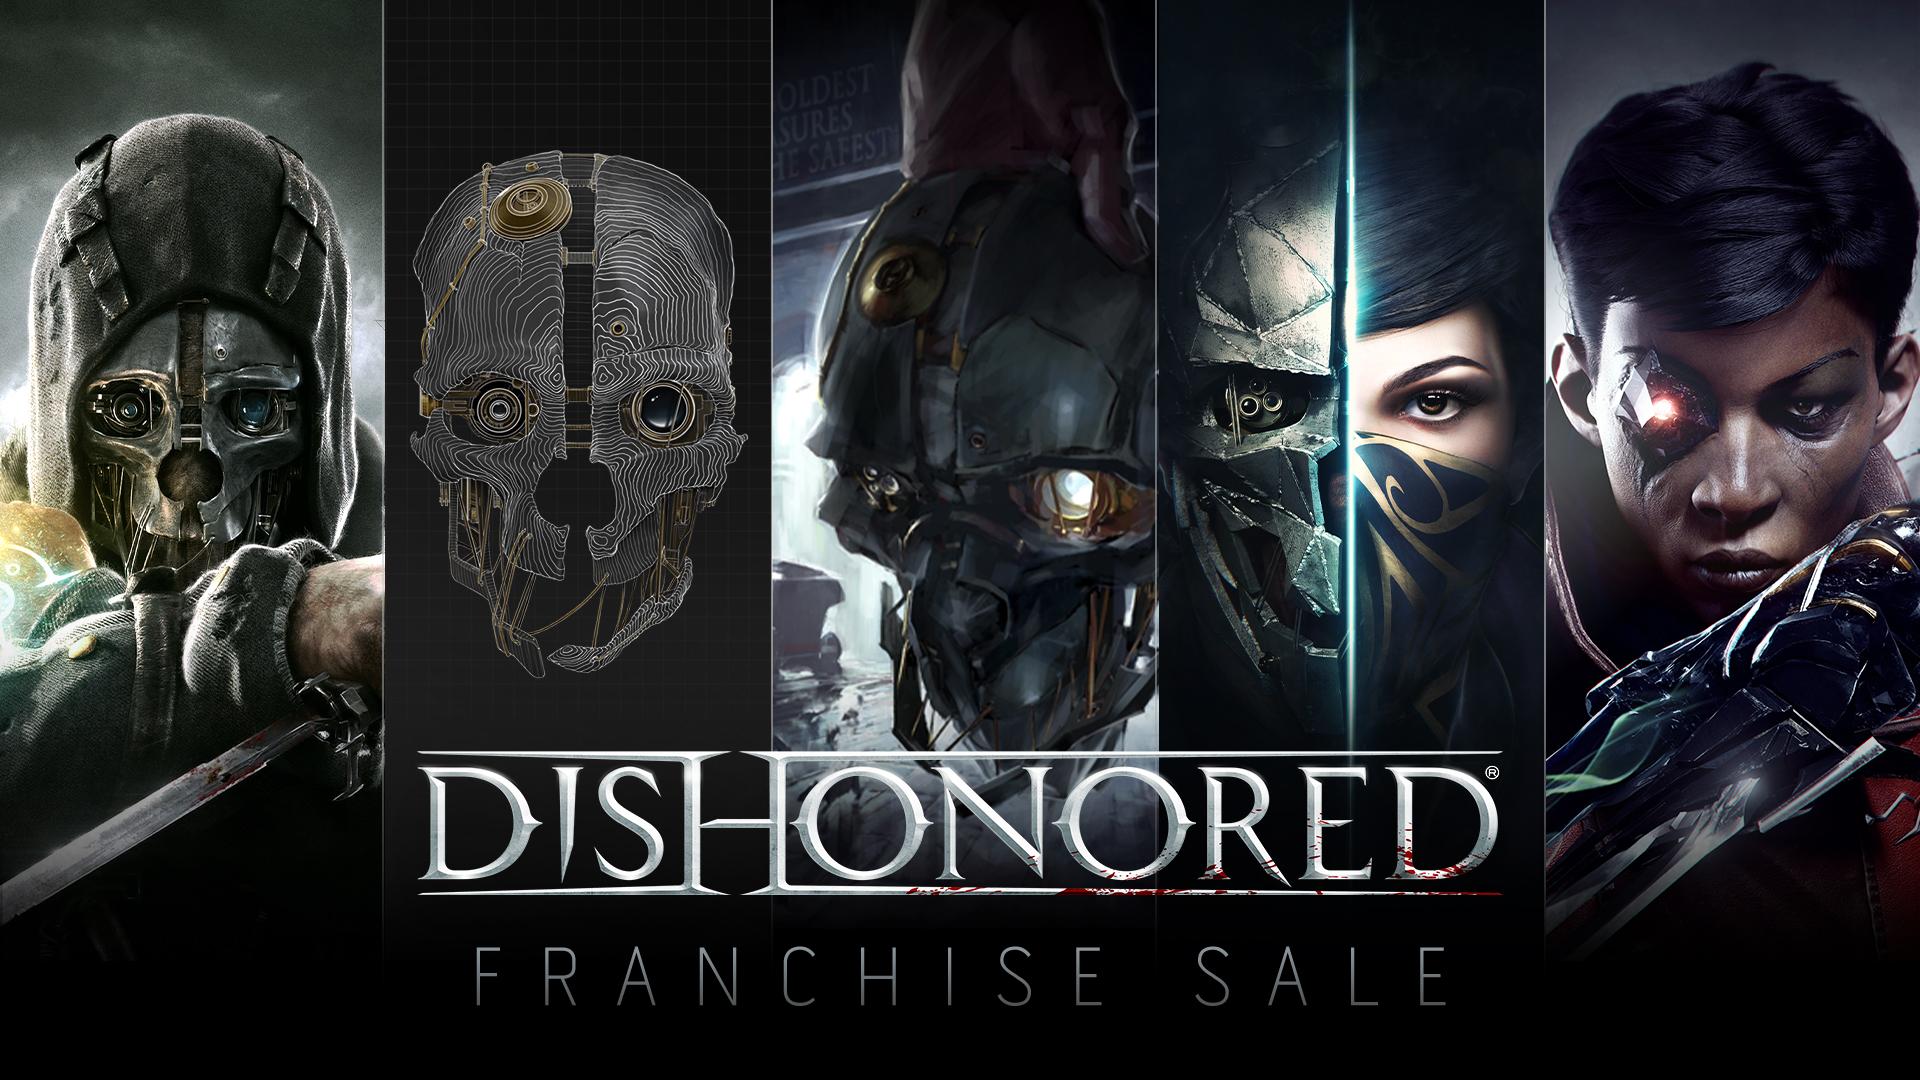 Franchise Dishonored